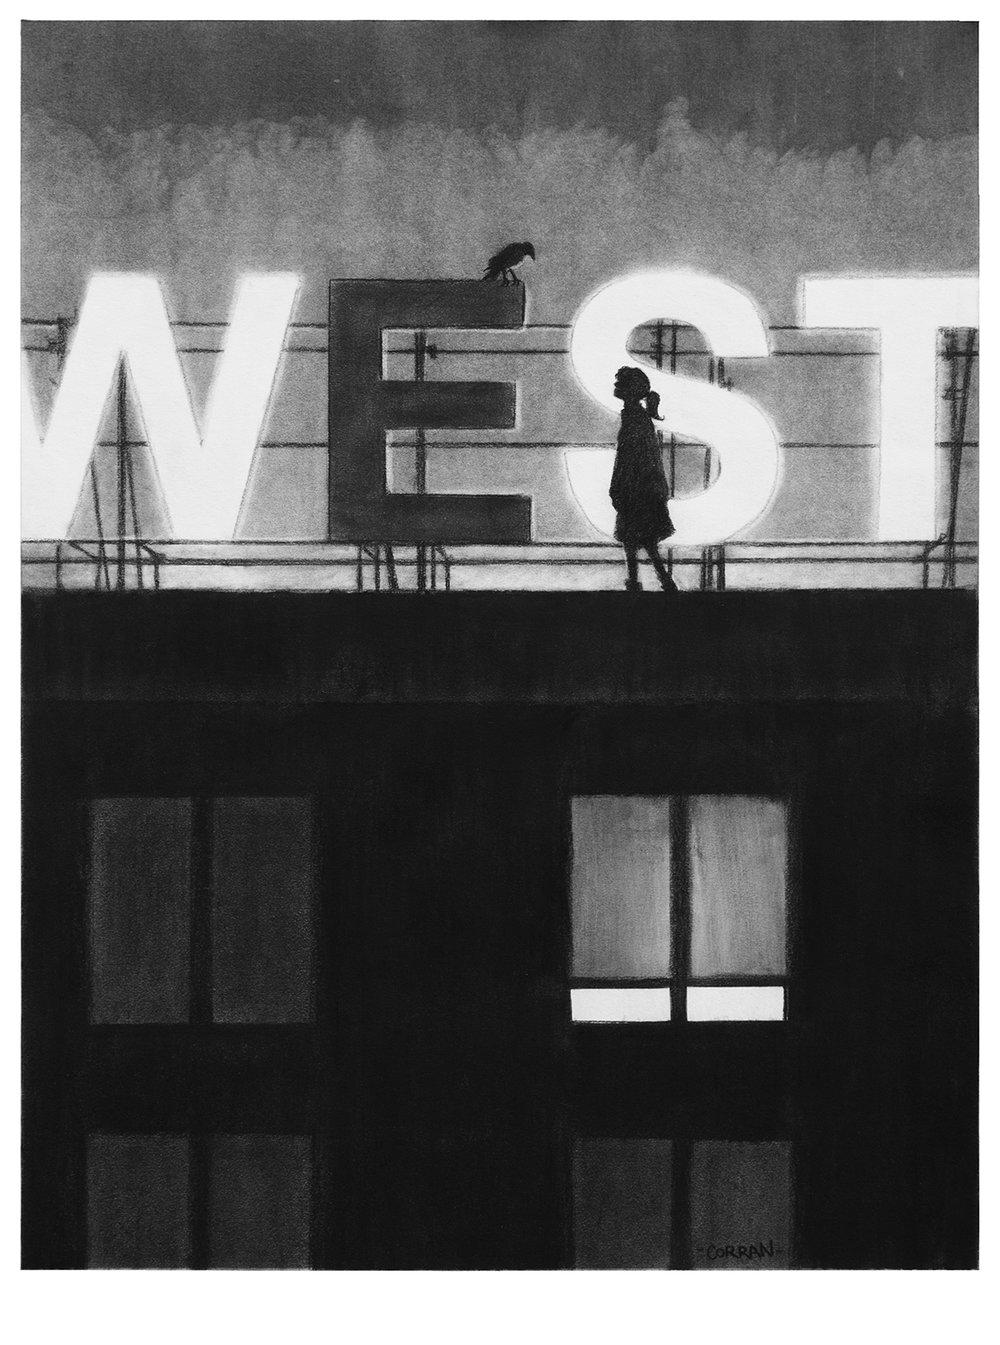 West, 2018